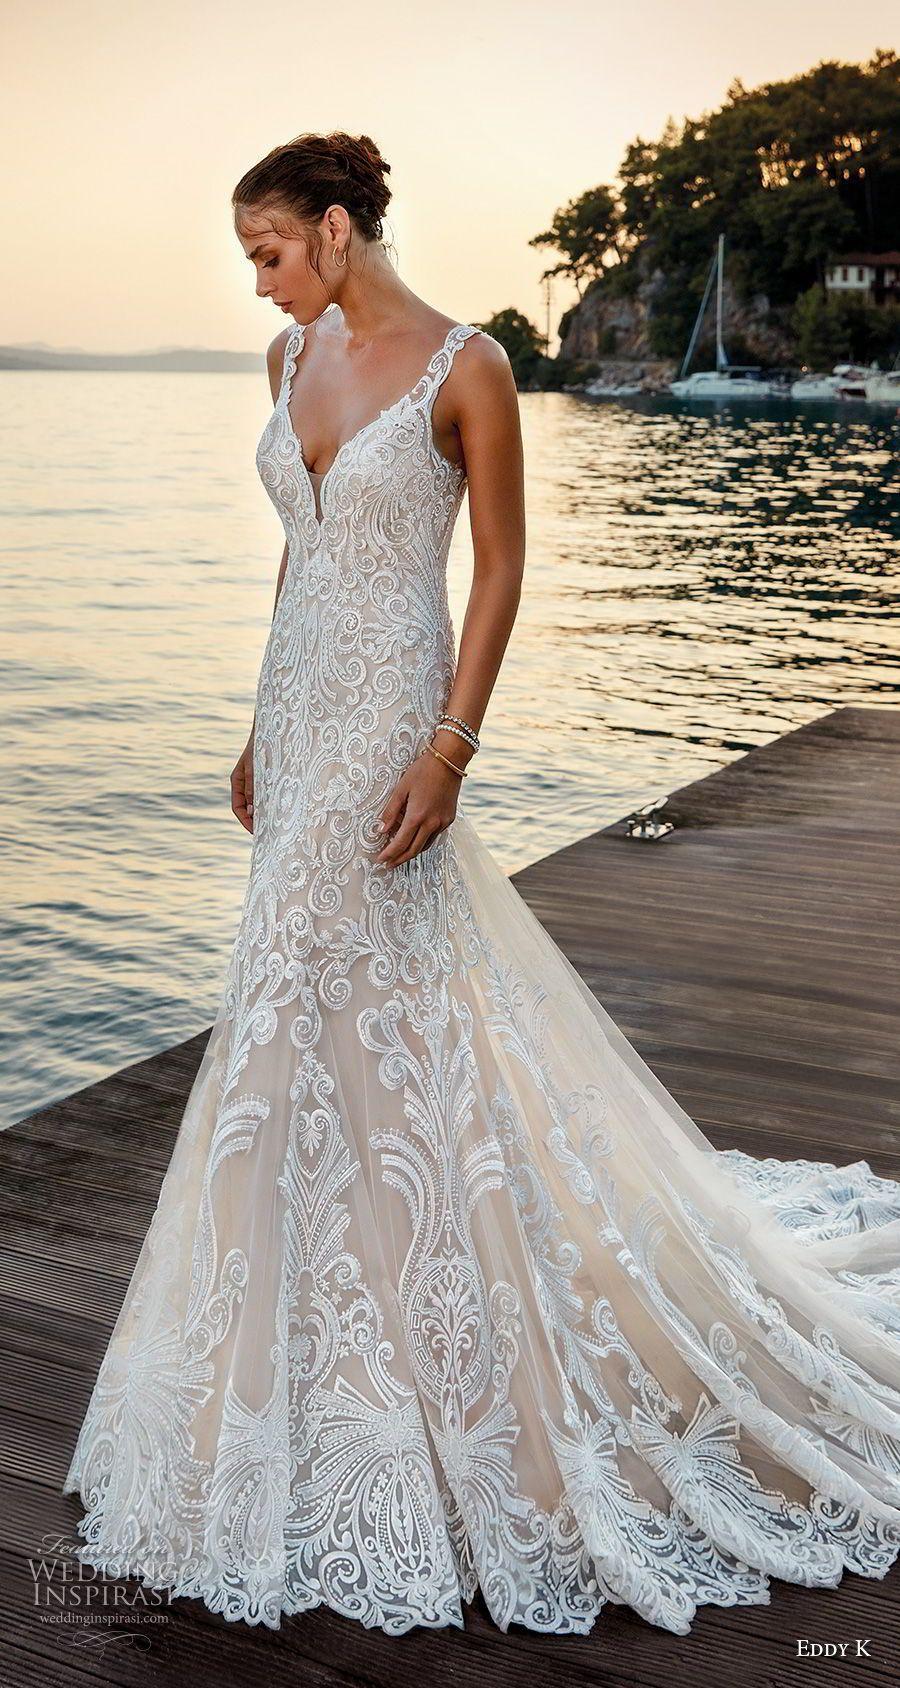 726a7c406642 eddy k 2018 bridal sleeveless with strap v neck full embellishment elegant  trumpet wedding dress sheer lace back chapel train (27) mv -- Eddy K. Dreams  2019 ...